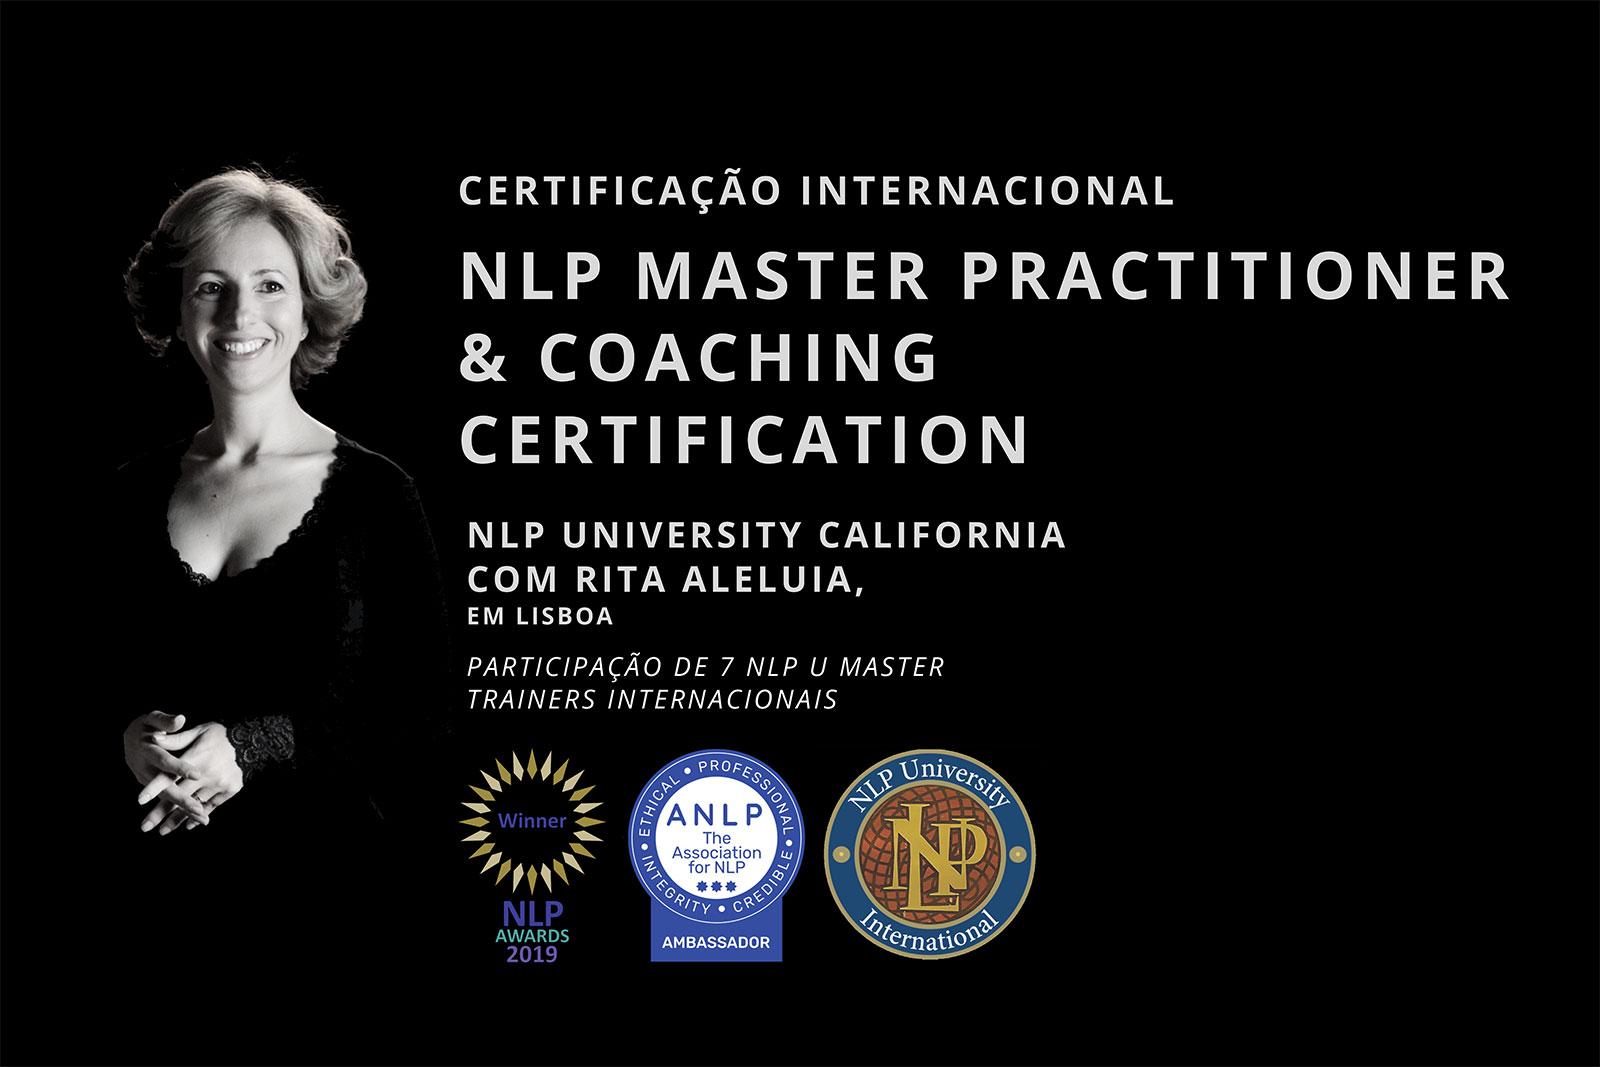 NLP University Master Practitioner & Coaching Certification